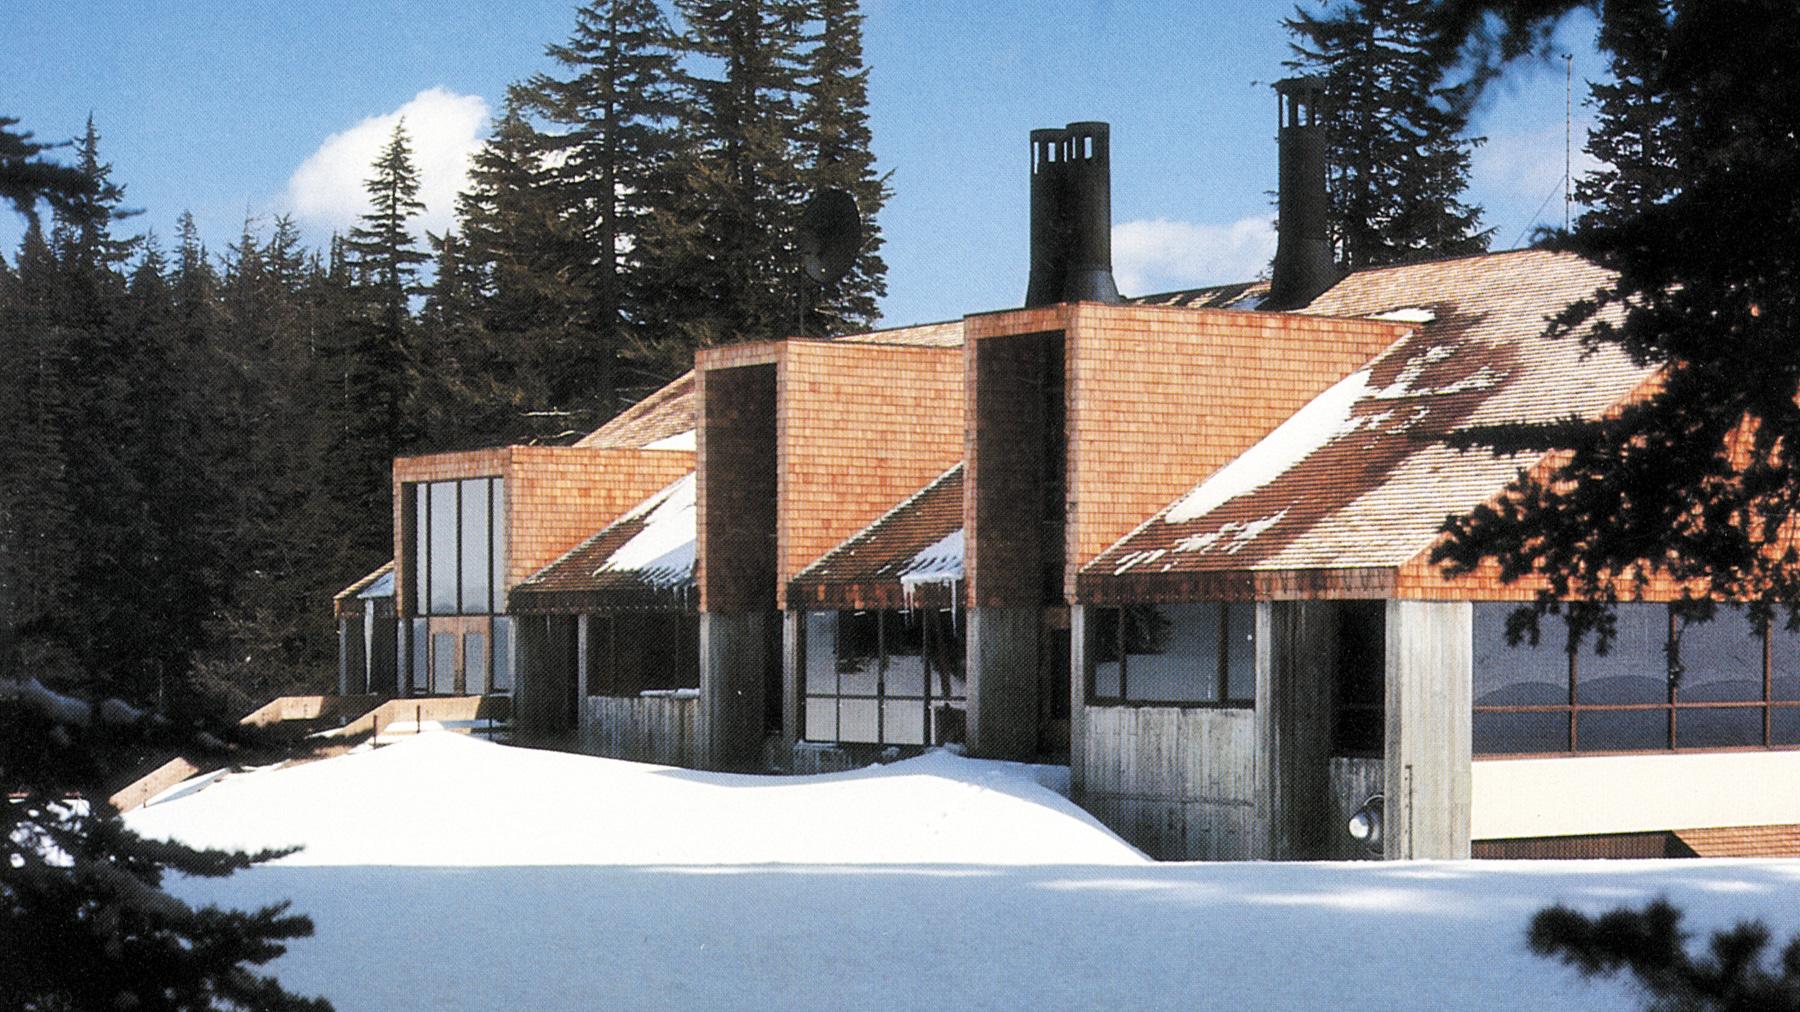 Mount Hood Meadows Ski Lodge